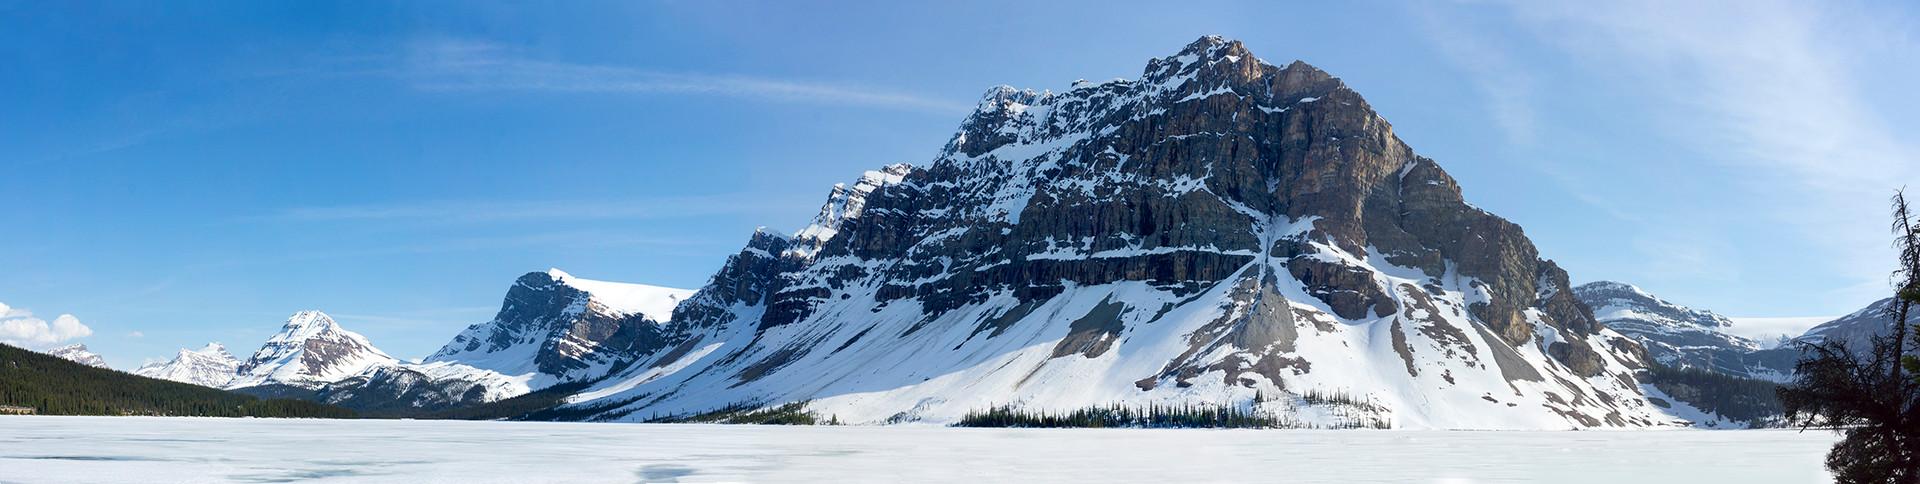 Bow Lake Alberta Wilderness